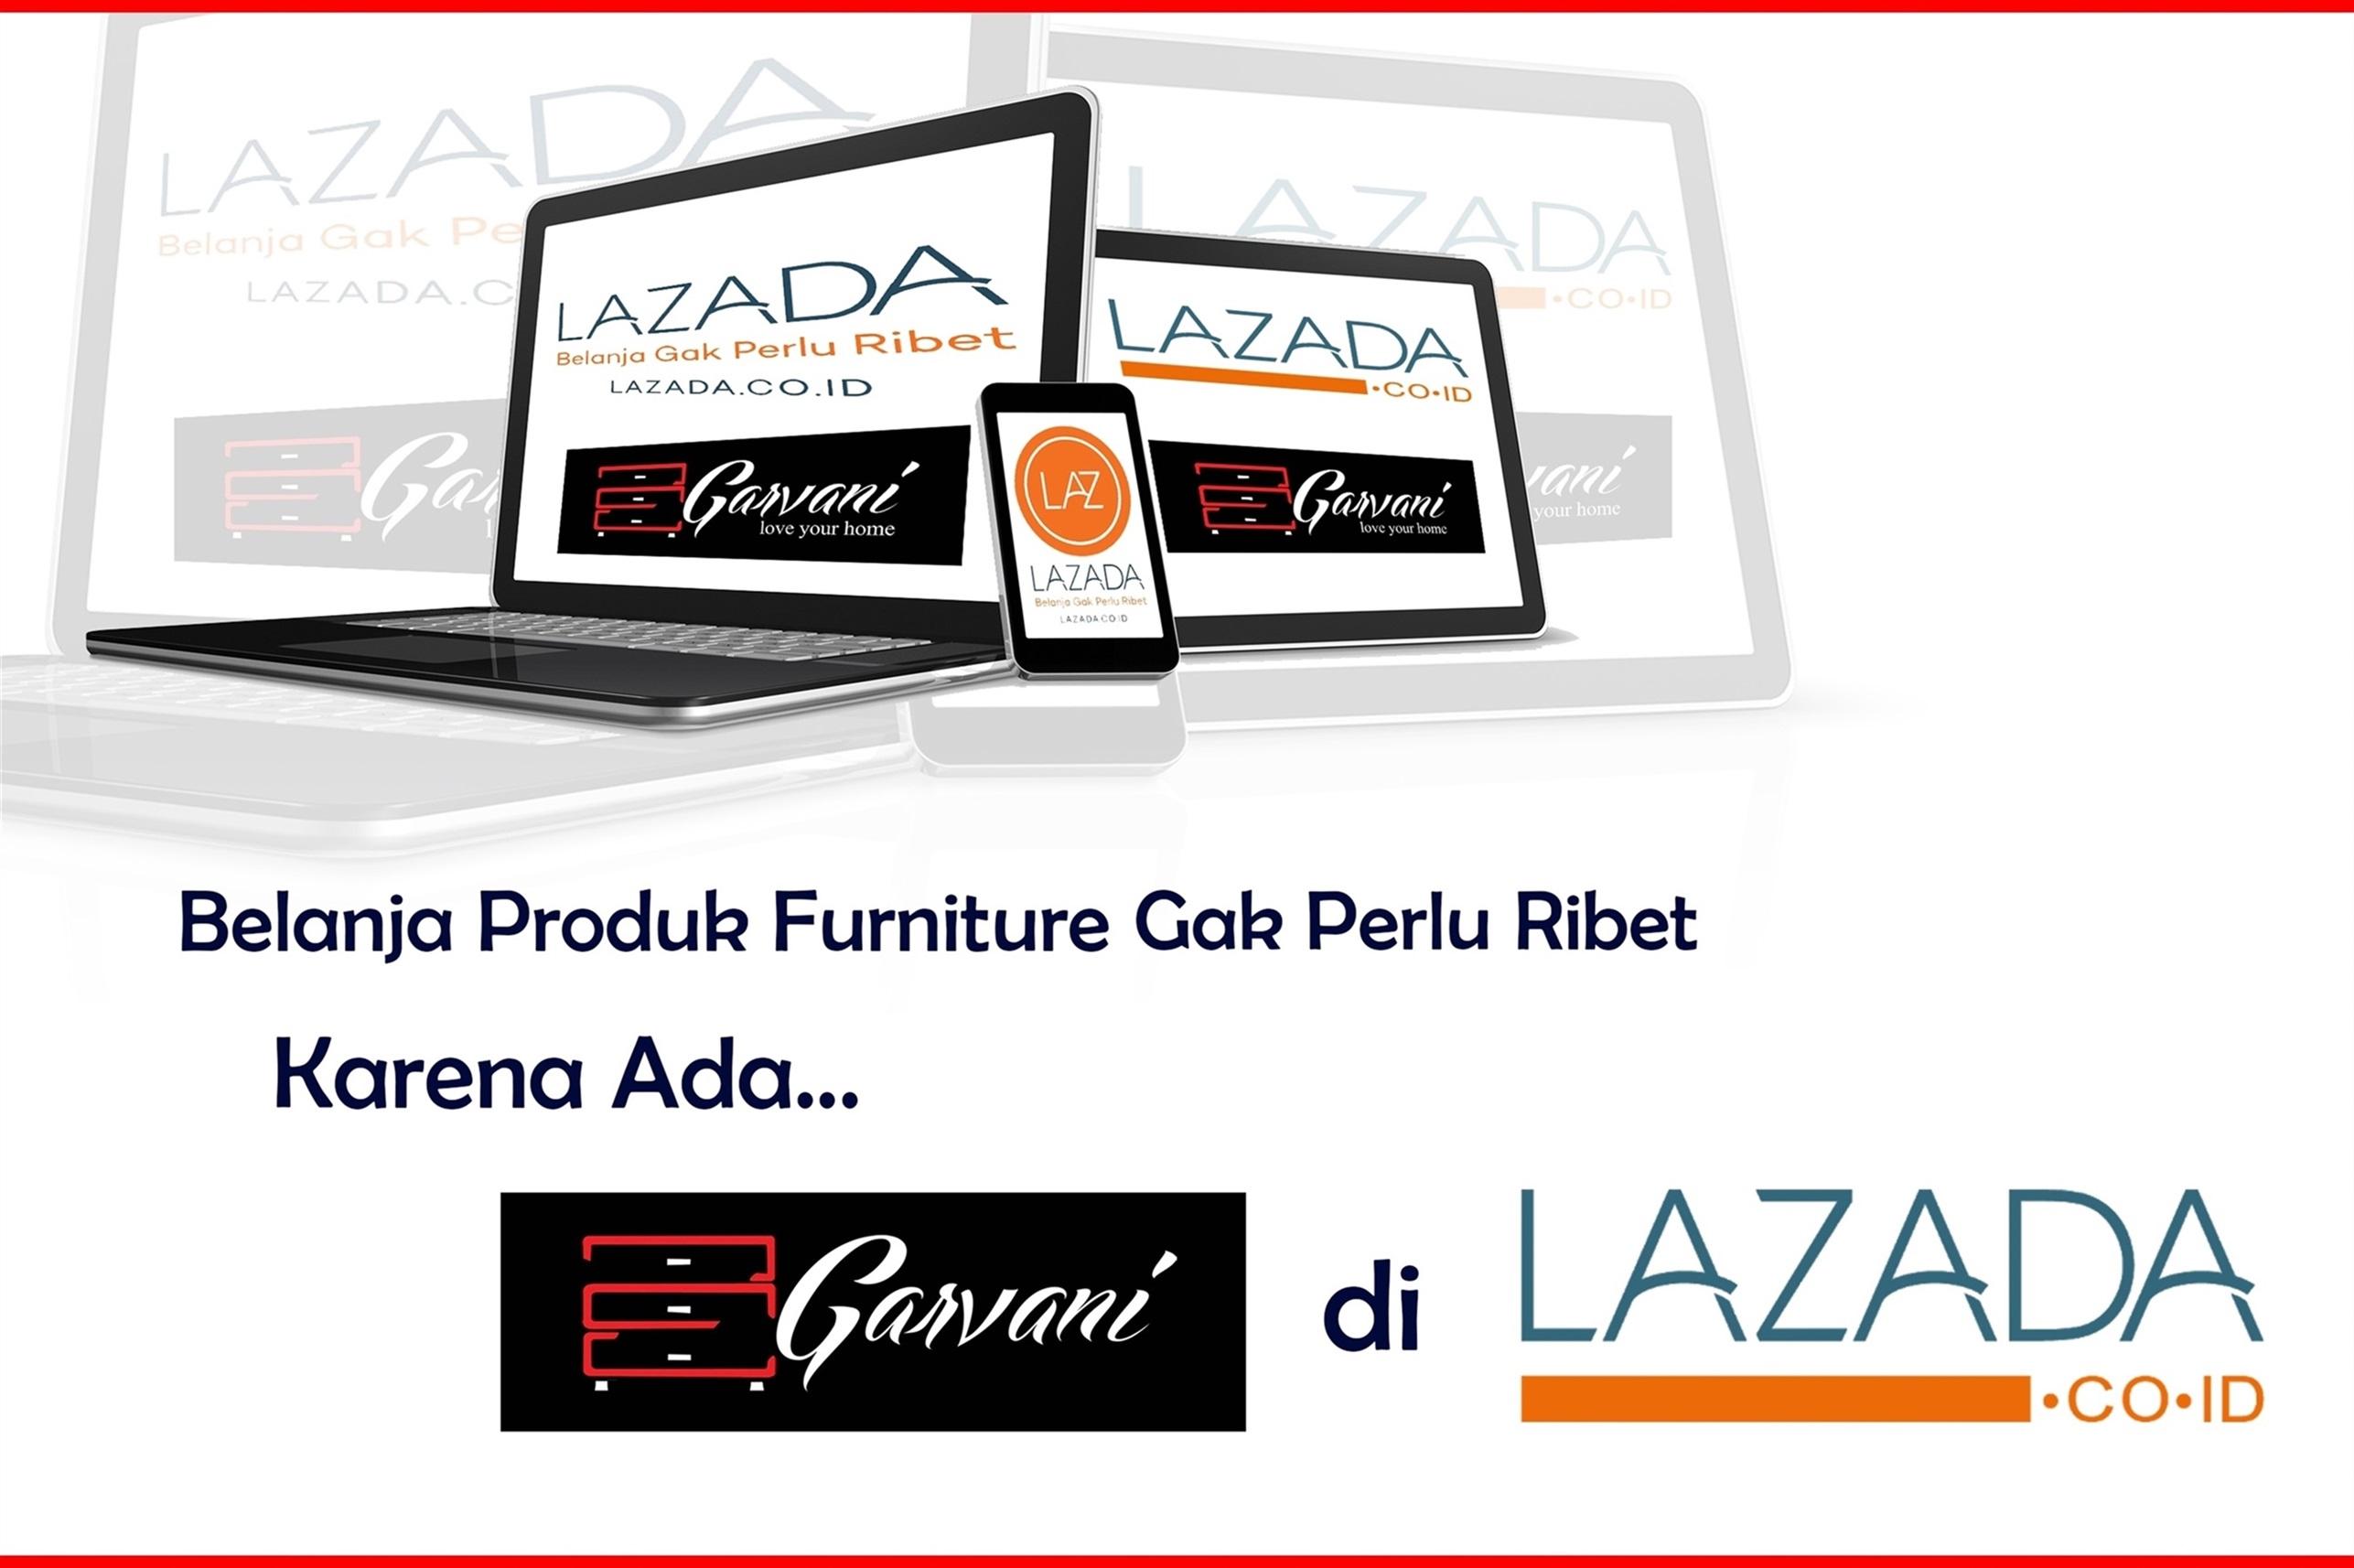 Garvani Furniture